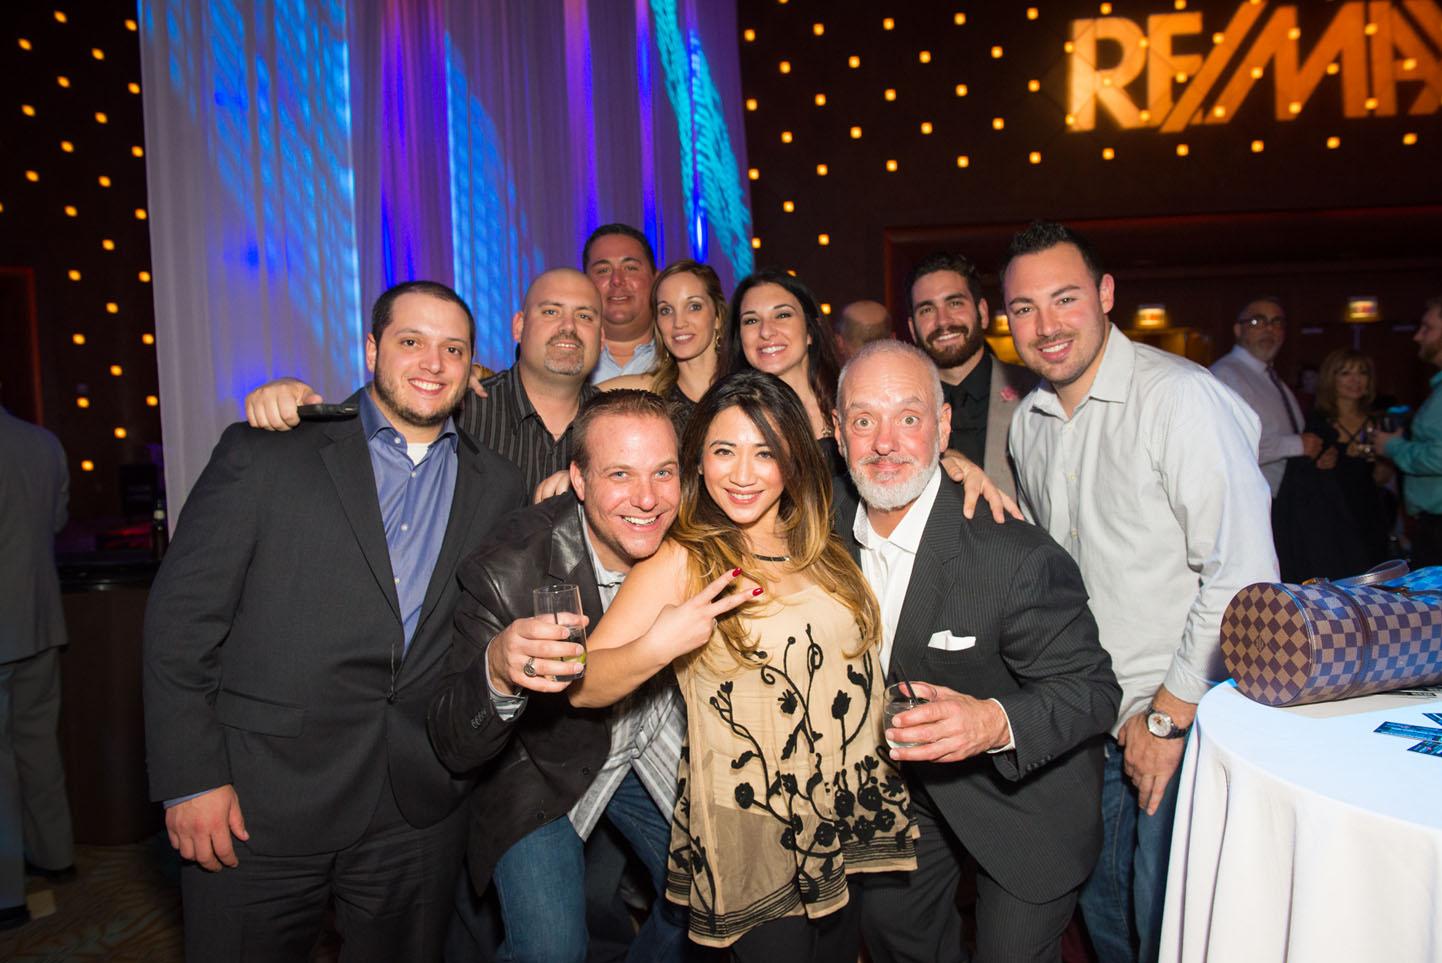 2015-12-09 ReMax Corpoarte Event - The Borgata - Atlantic City NJ - Photo Sesh - 2015-5283.jpg